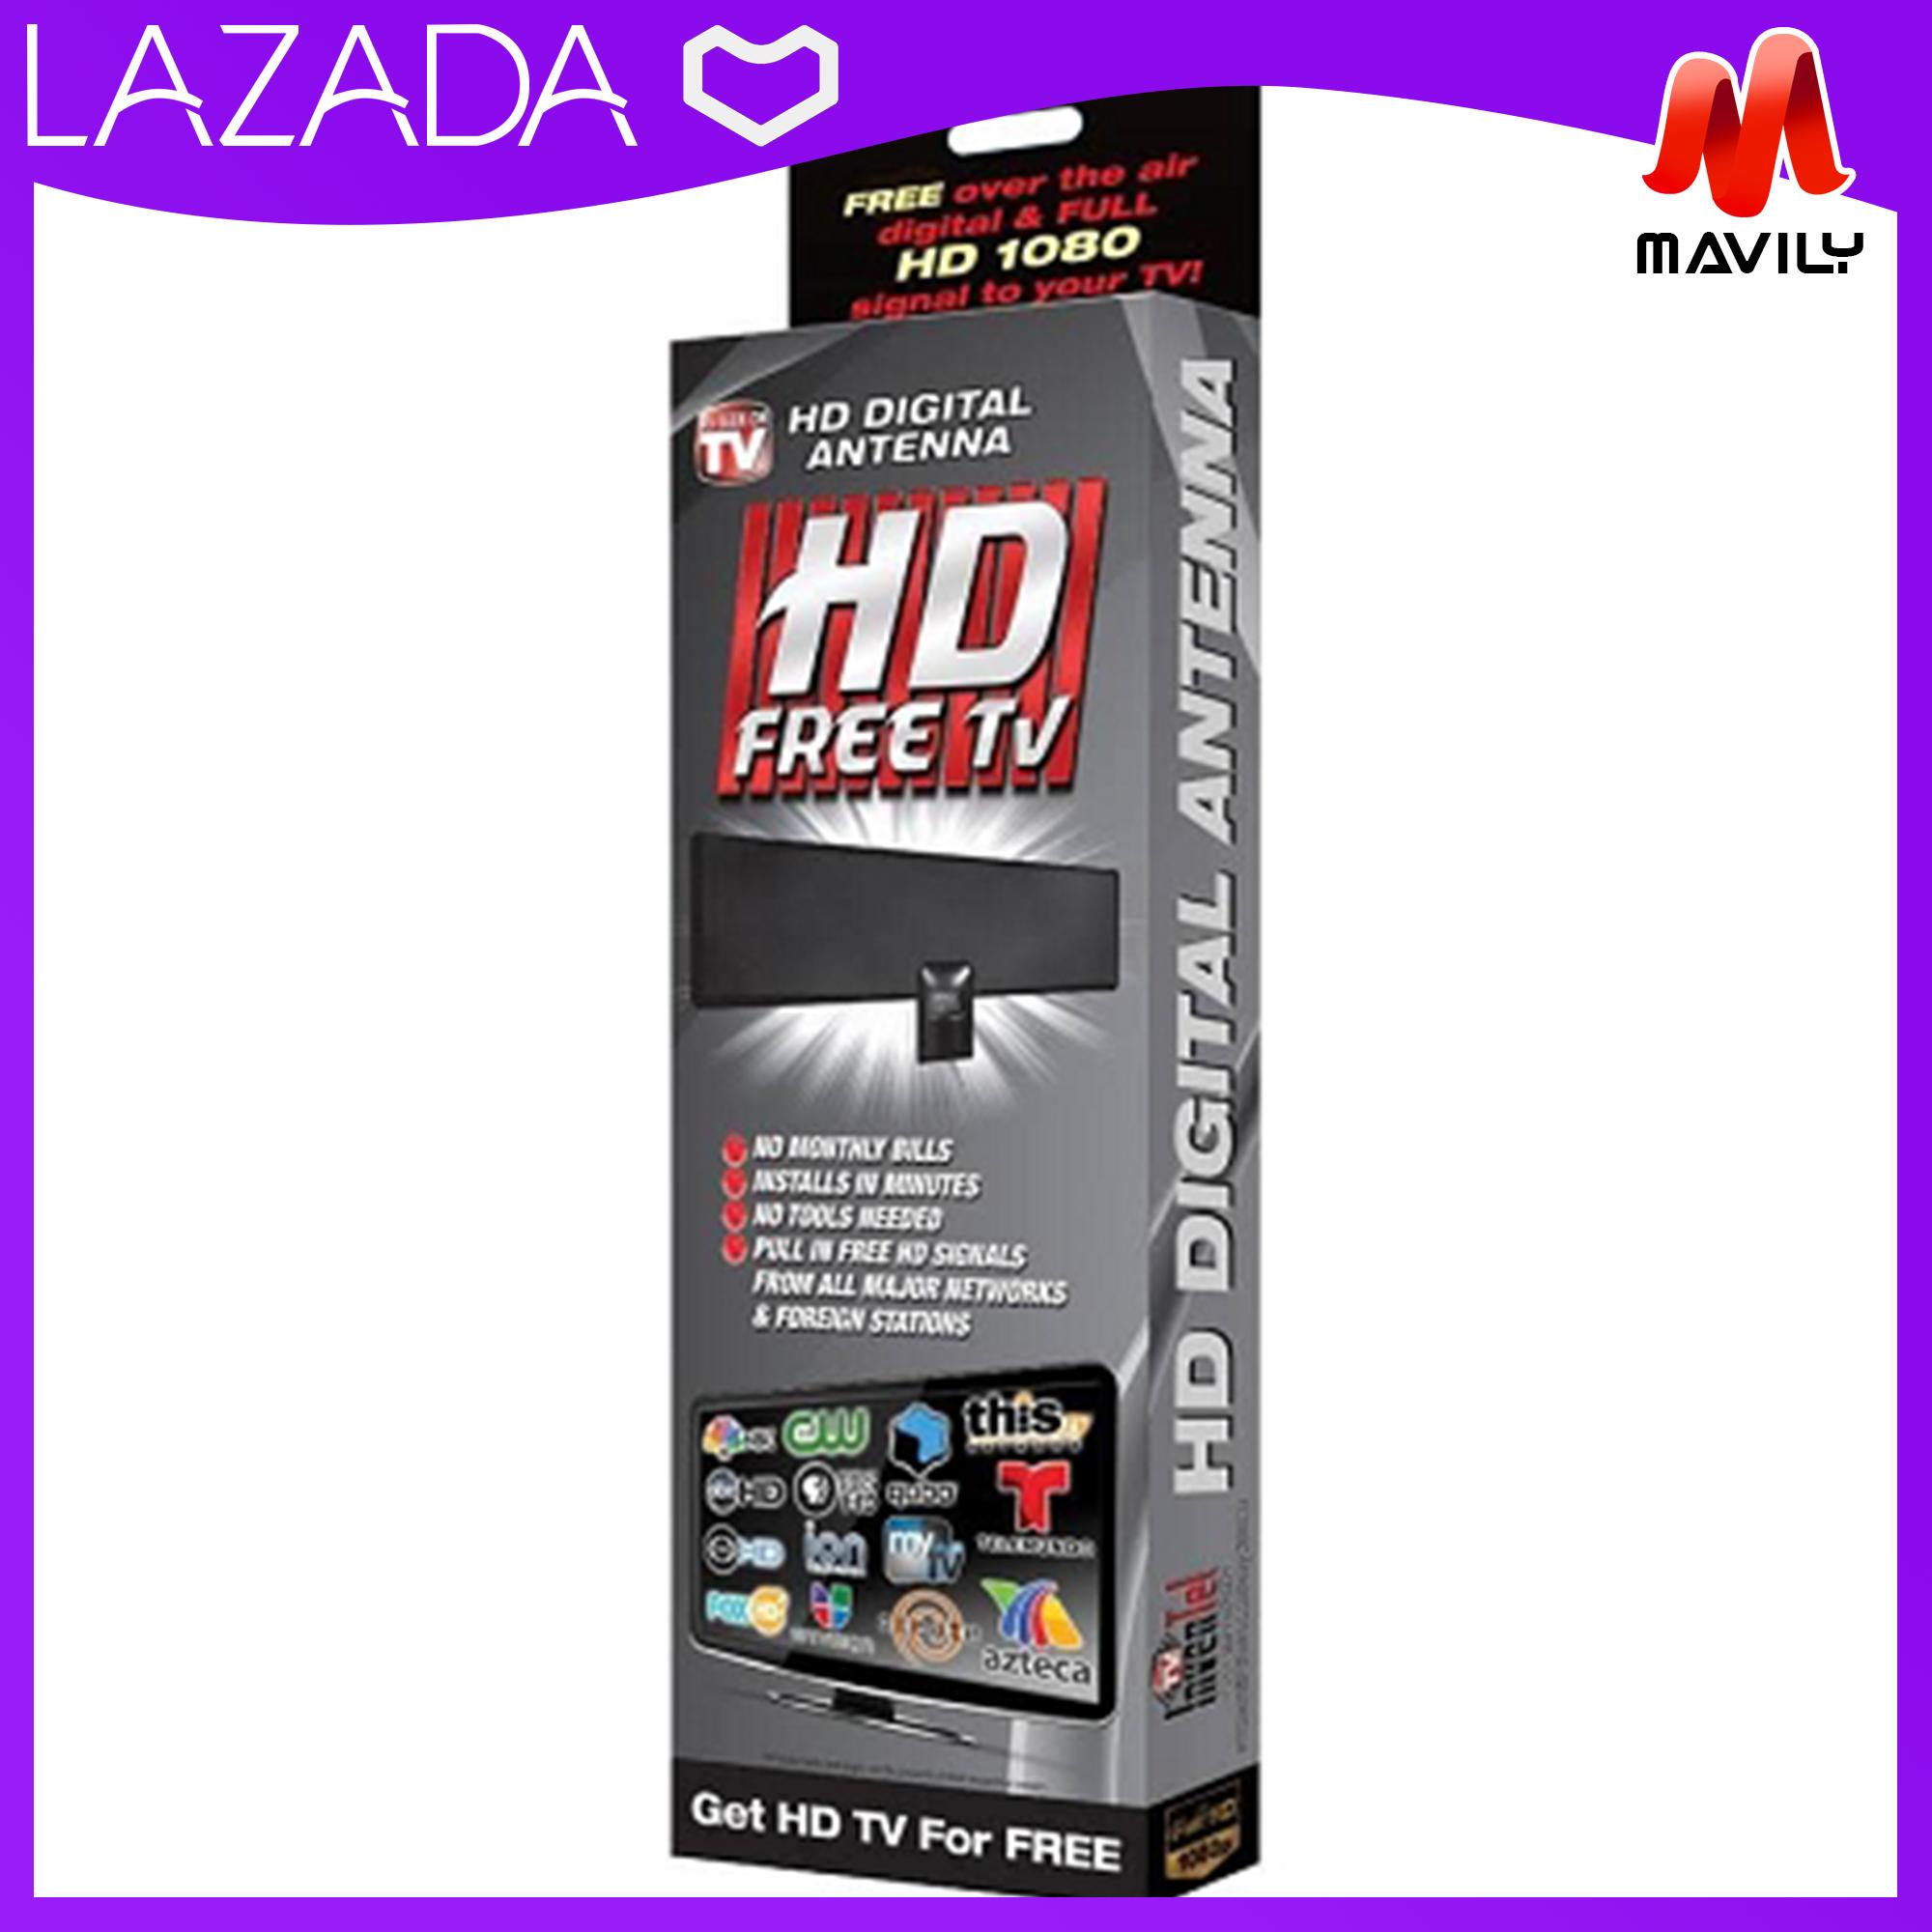 HD 1080p Digital Free TV Antenna